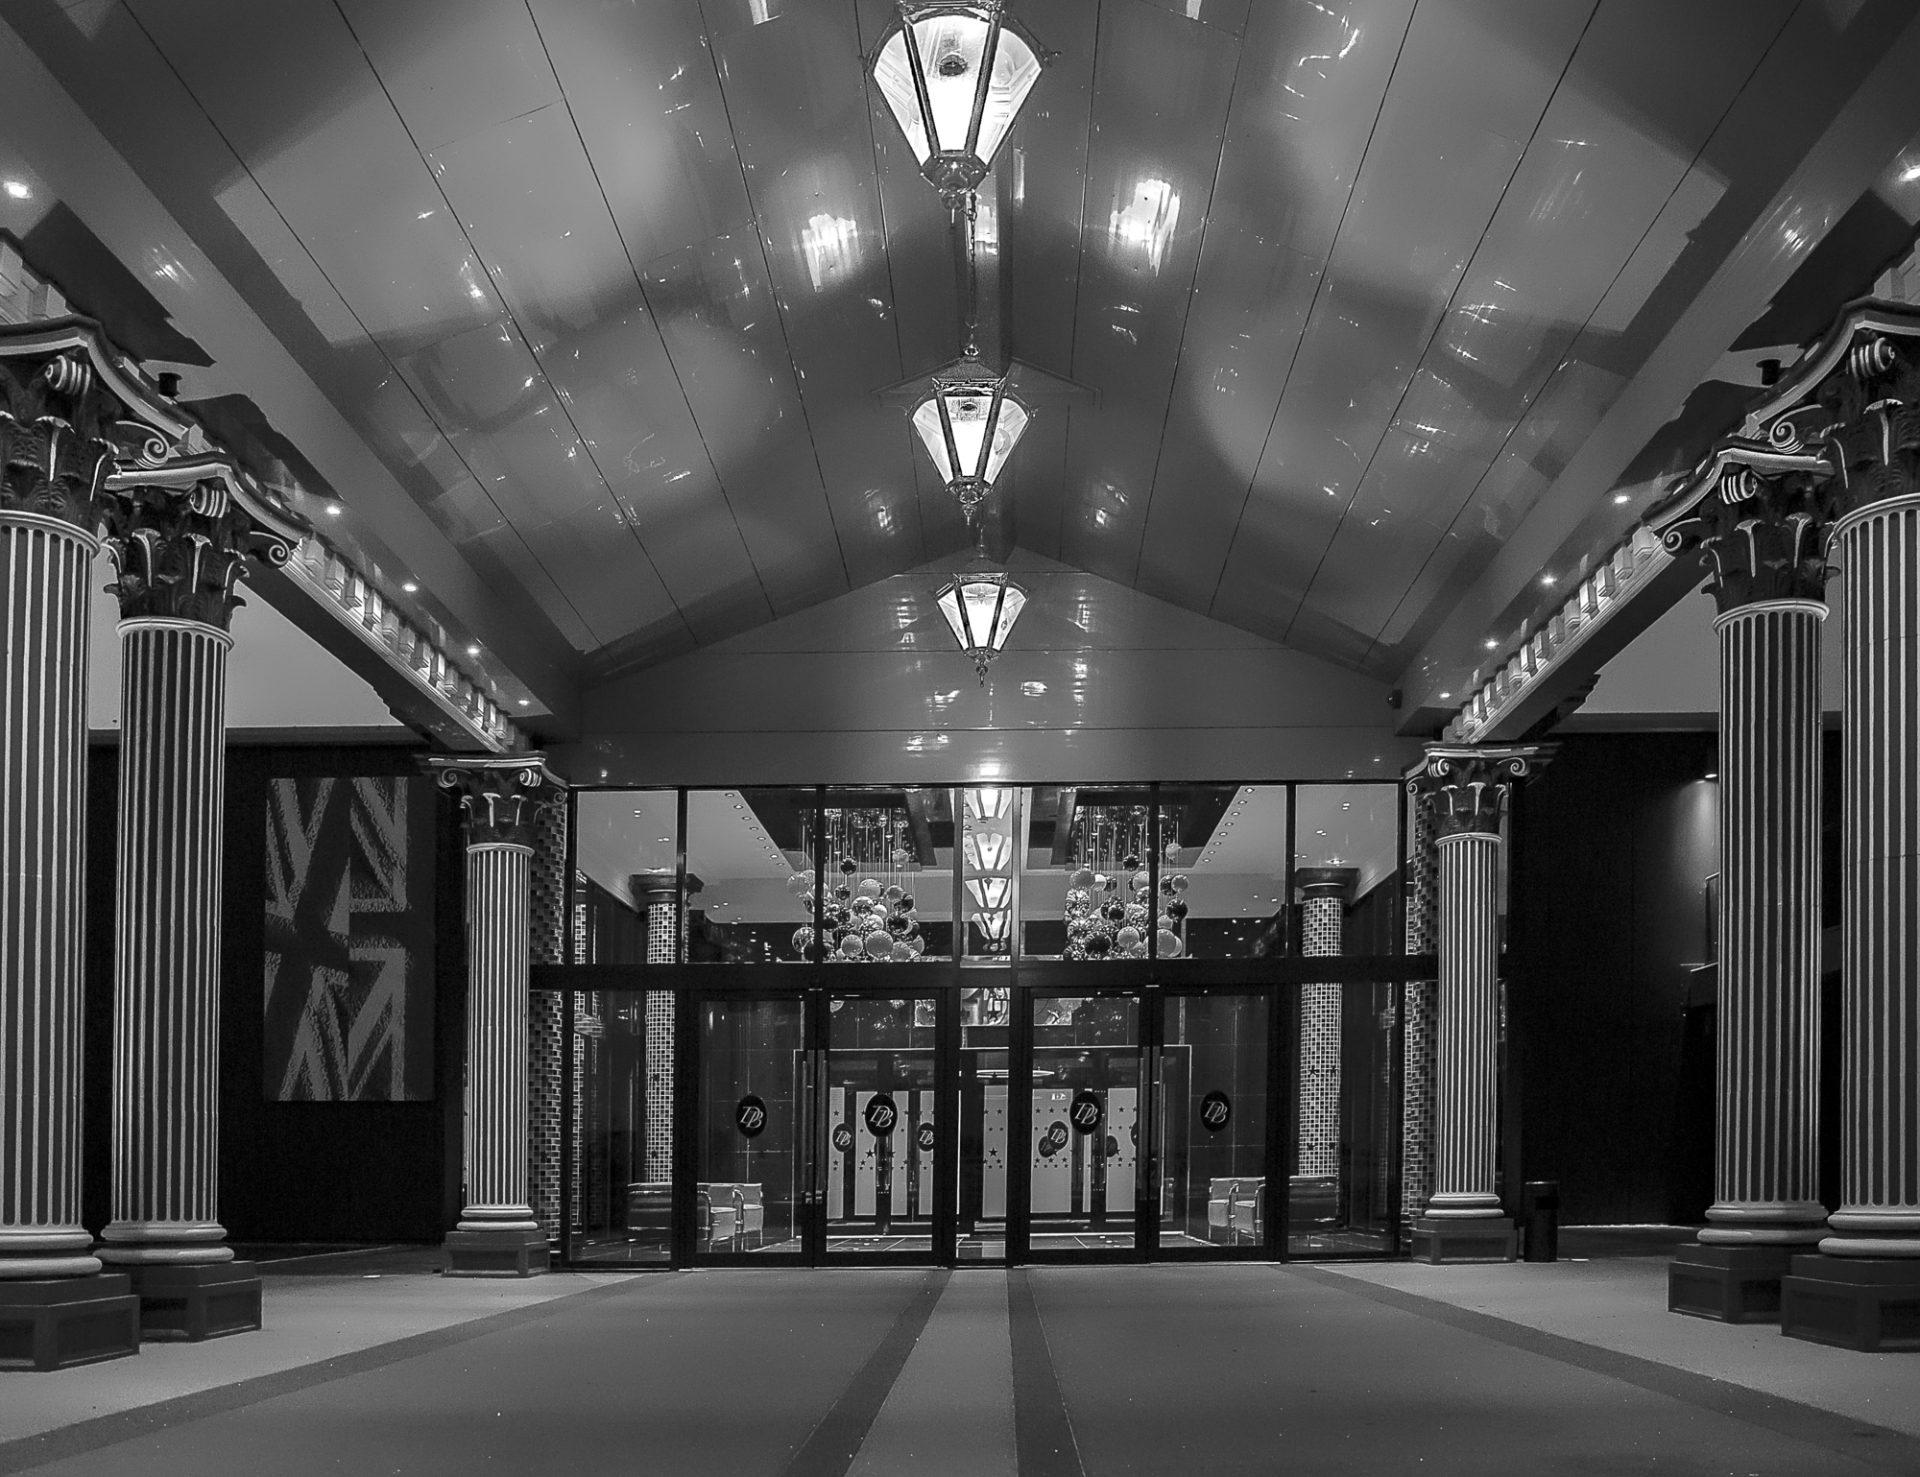 Dallas Burston Polo Club IXL Facilities